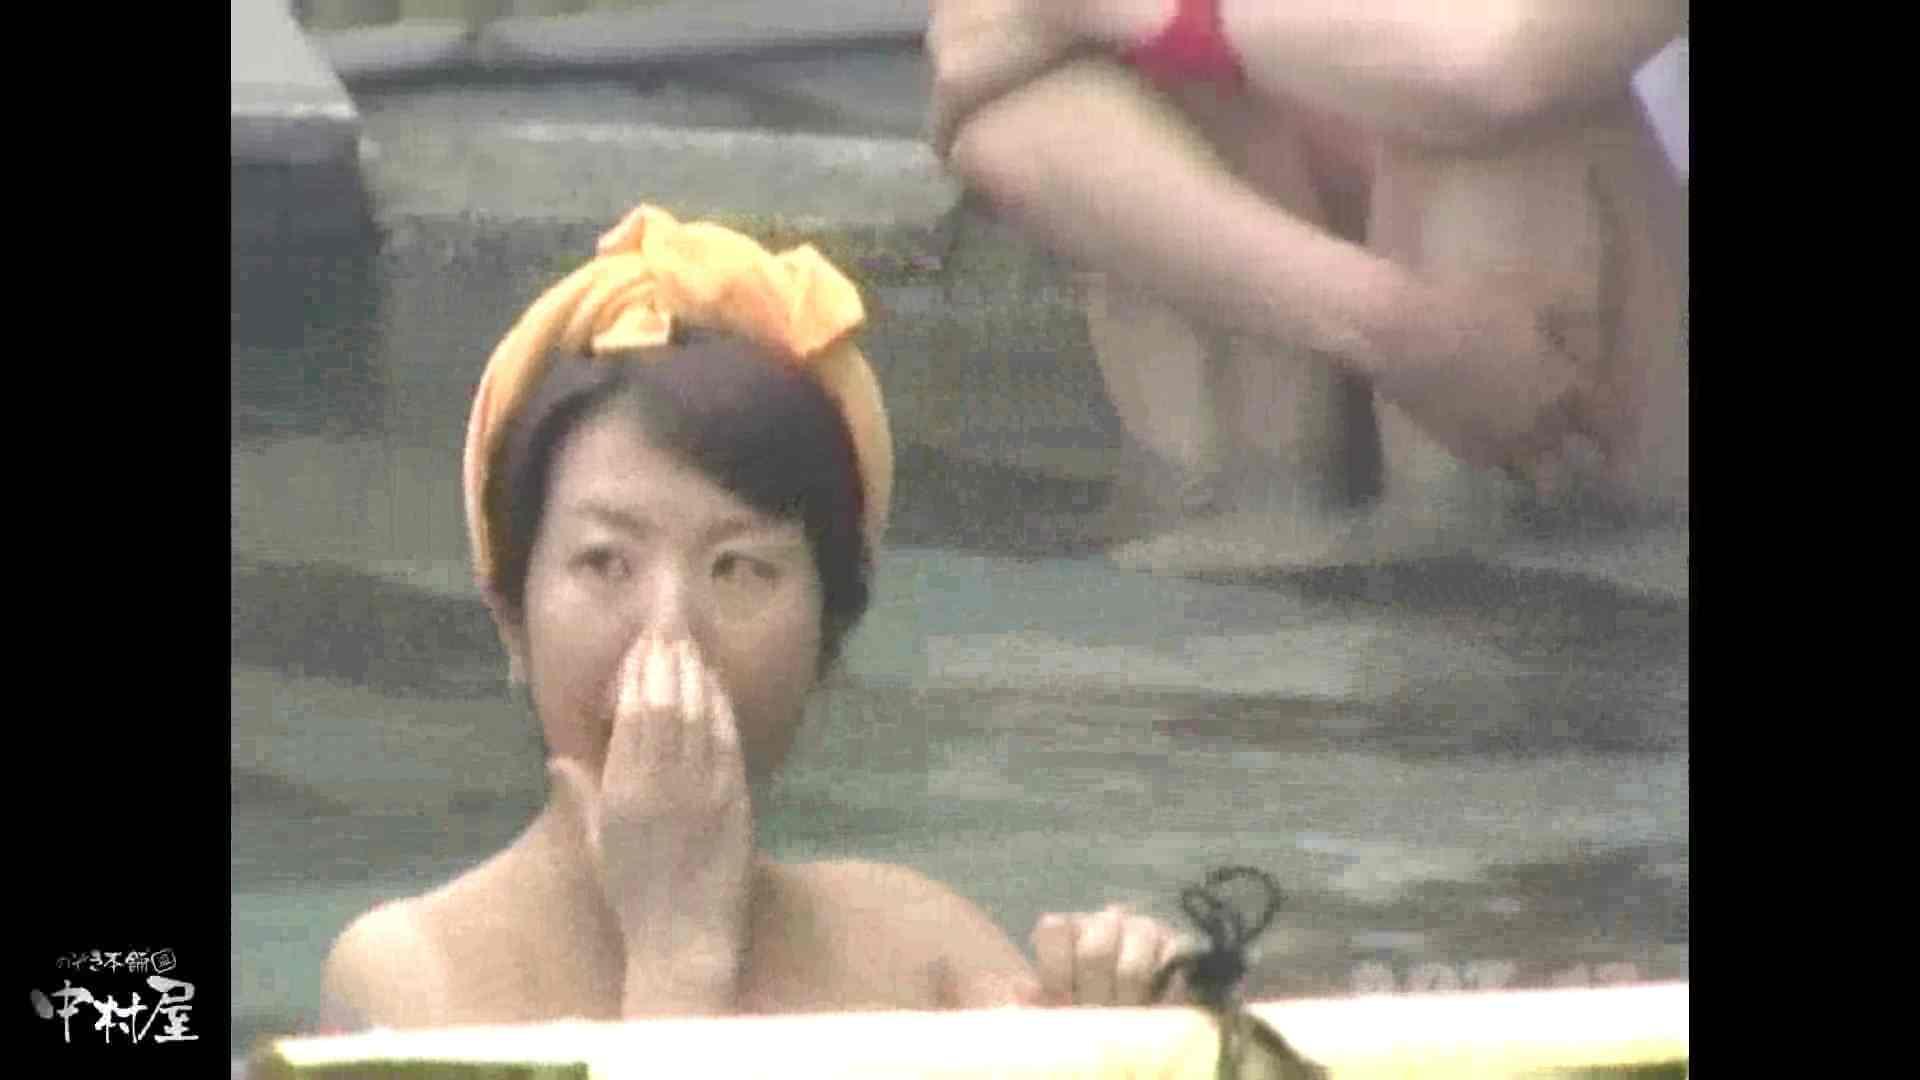 Aquaな露天風呂Vol.881潜入盗撮露天風呂十七判湯 其の五 美しいOLの裸体 オマンコ無修正動画無料 102pic 70